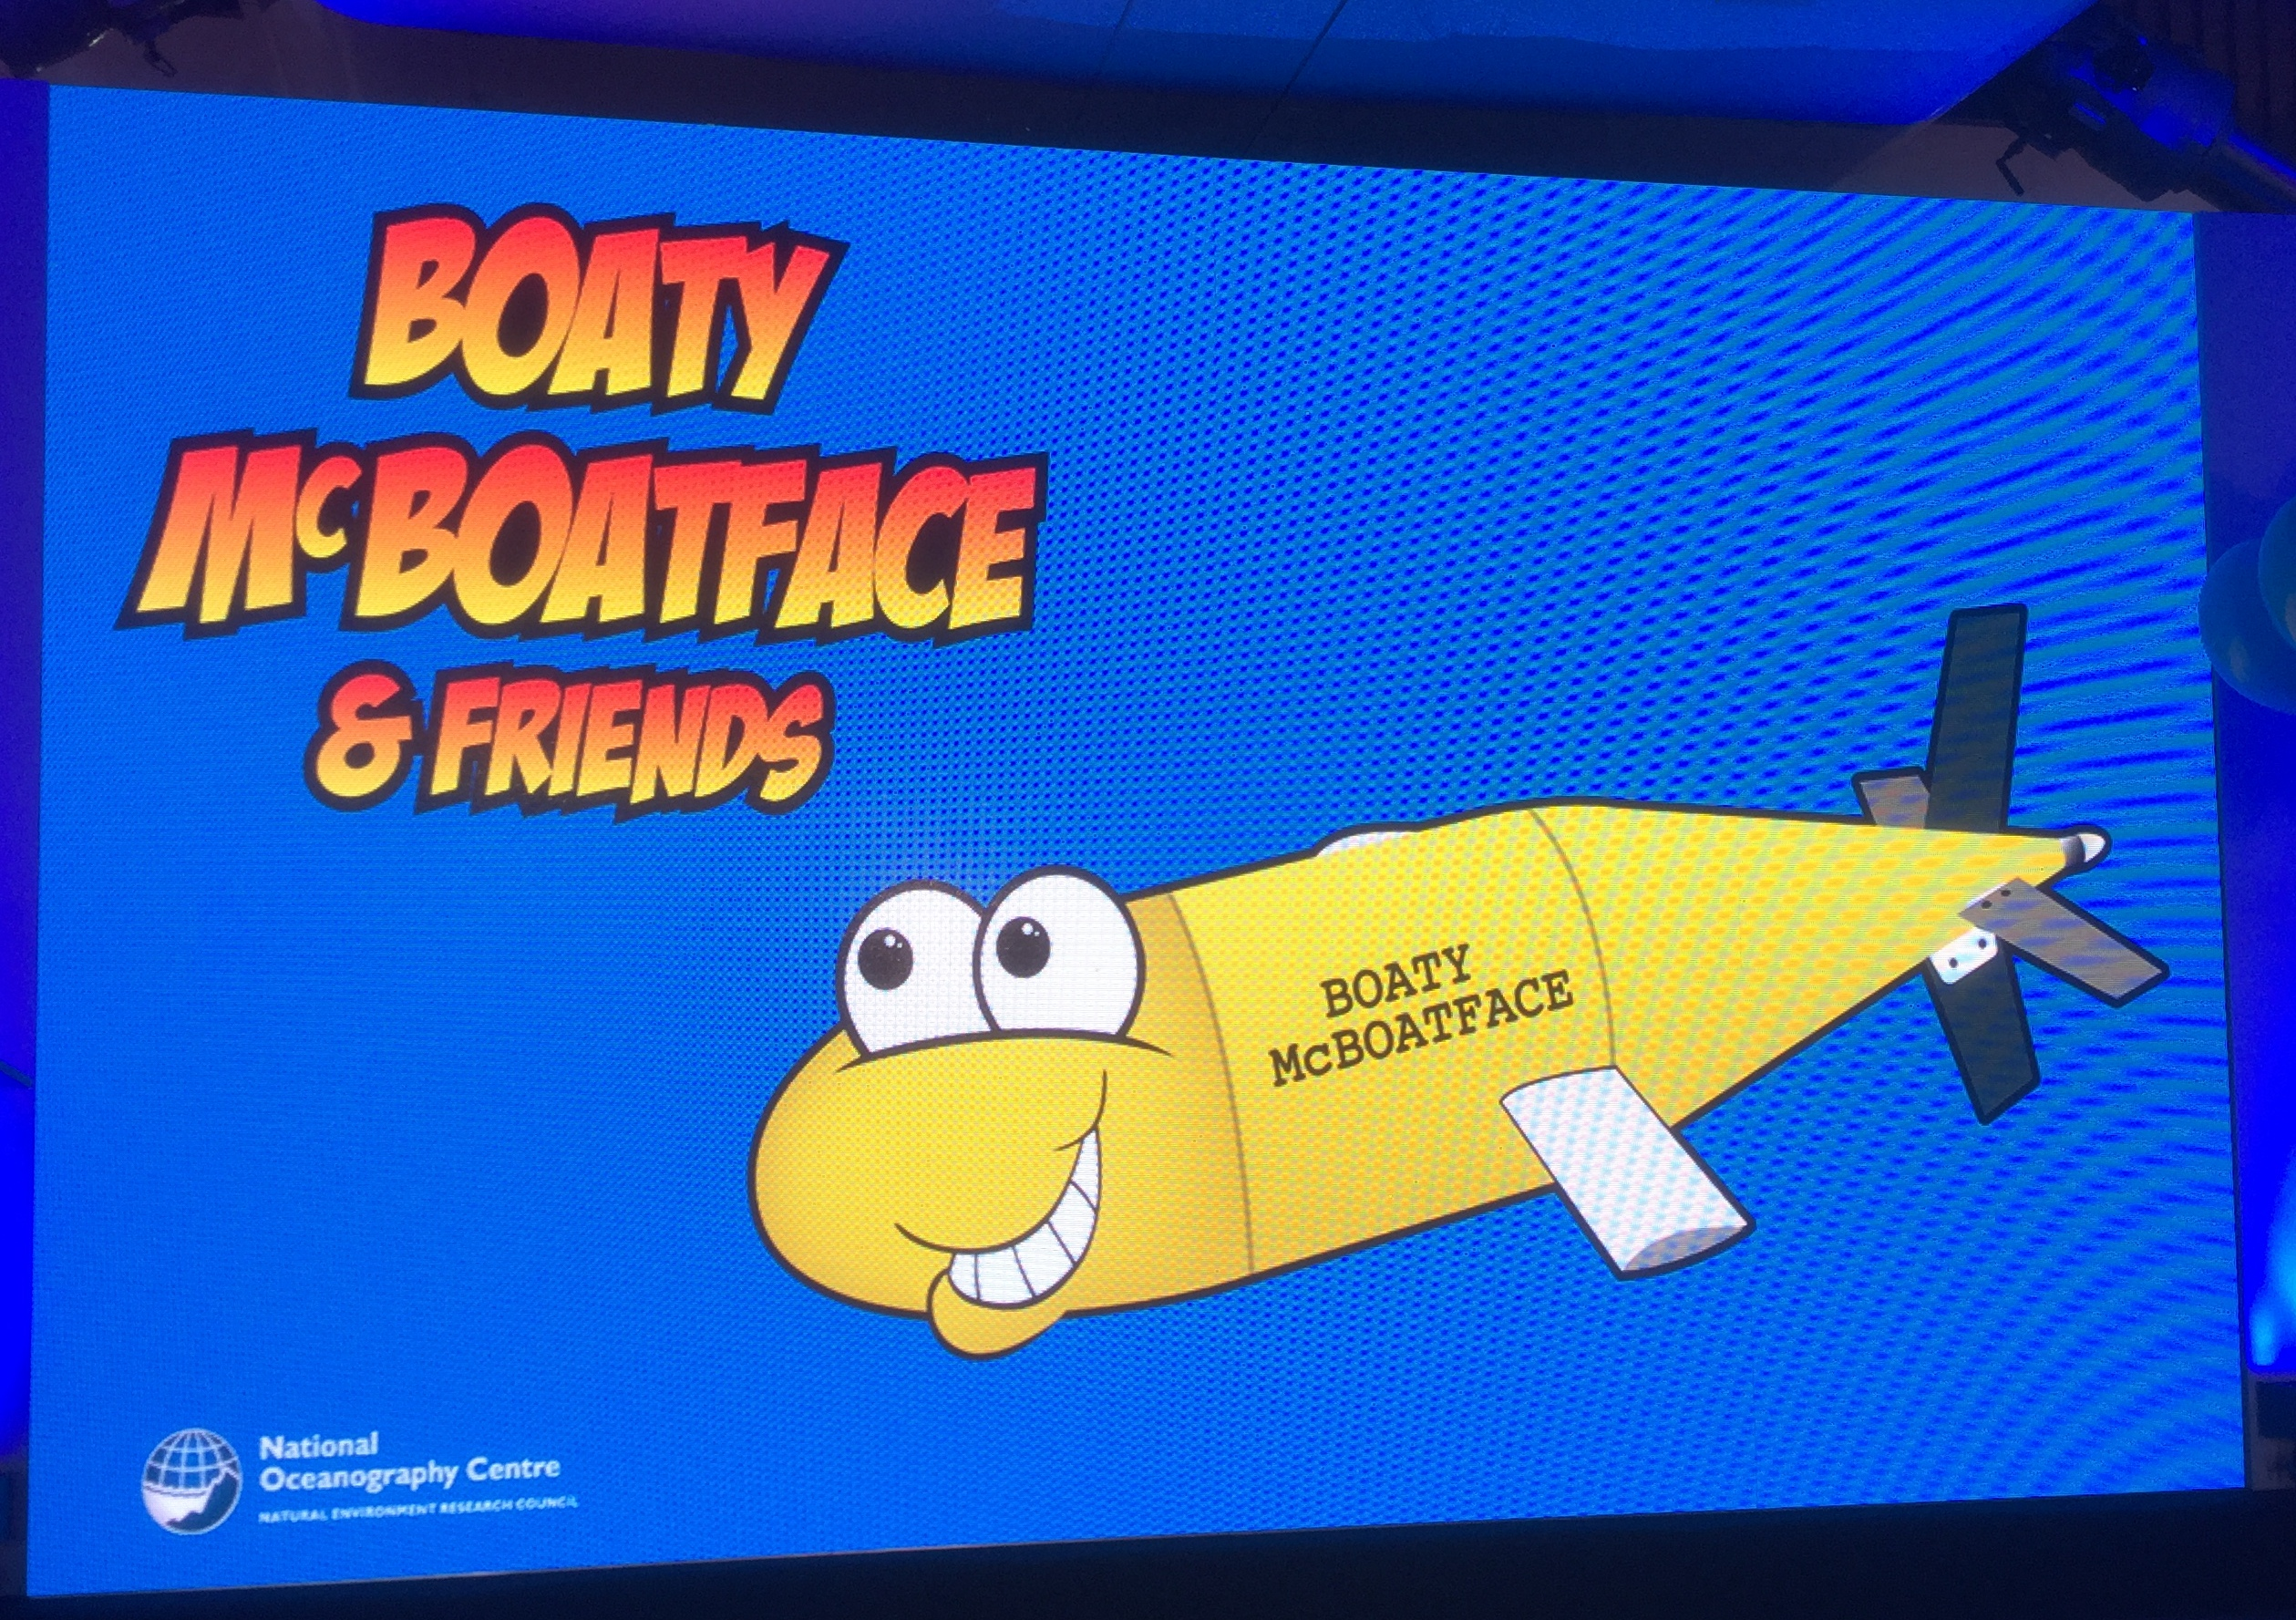 BoatyMcBoatface